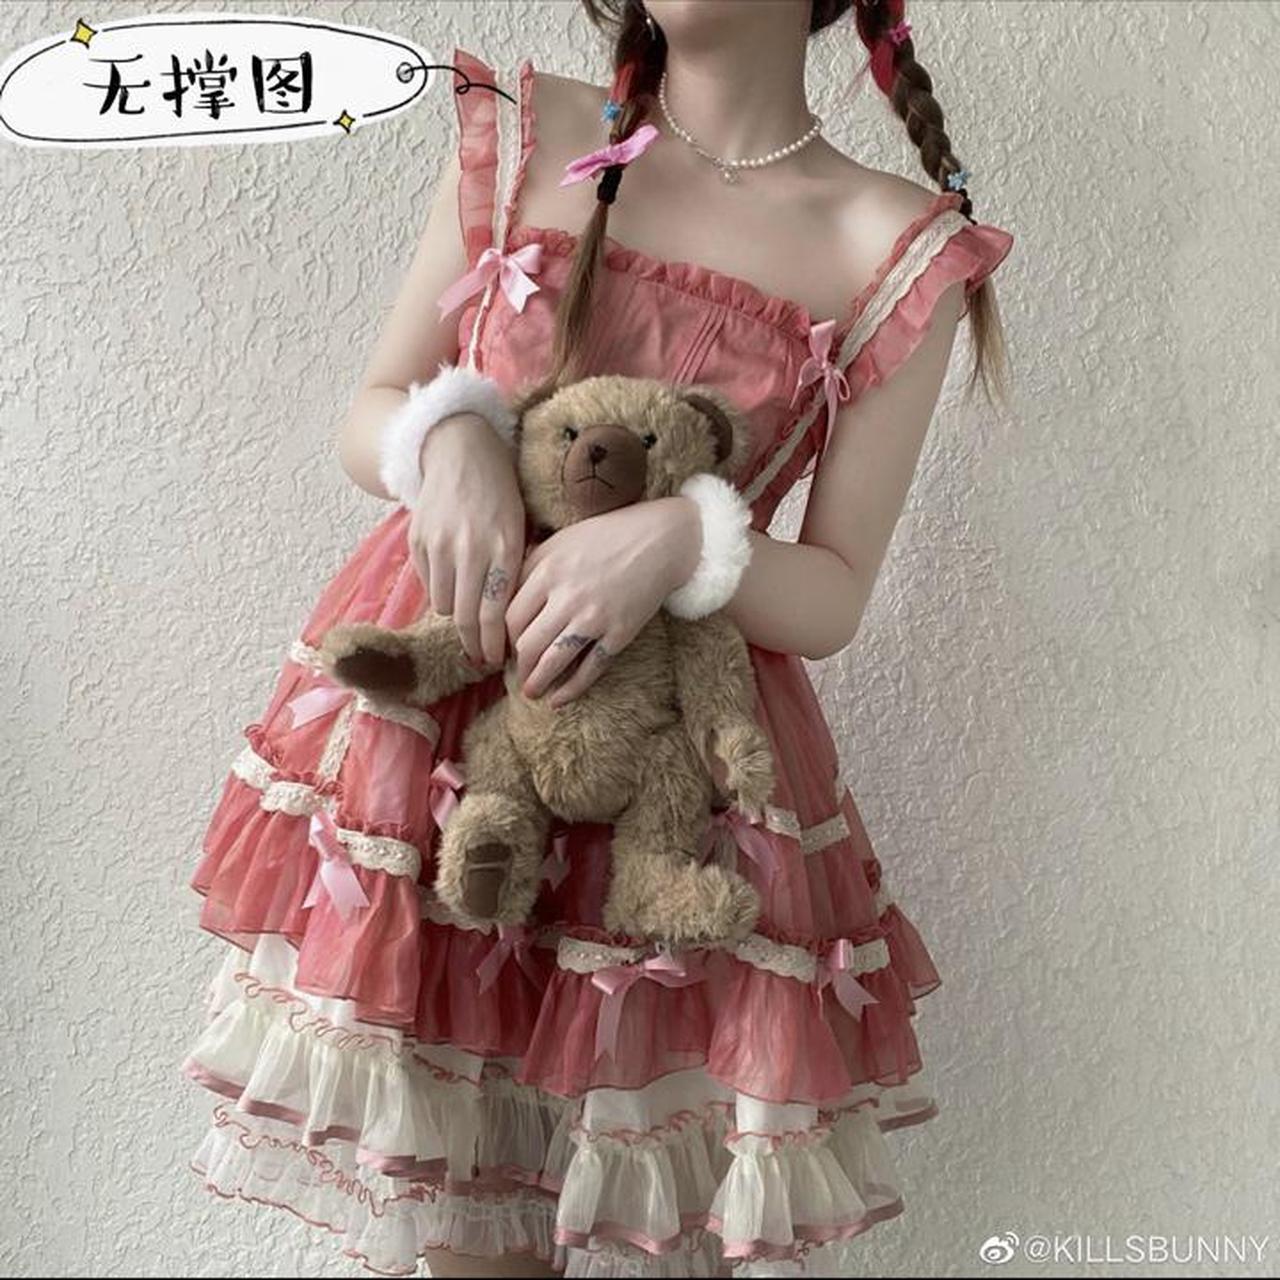 Product Image 1 - Killsbunny Lolita Dress Peiliee Shop